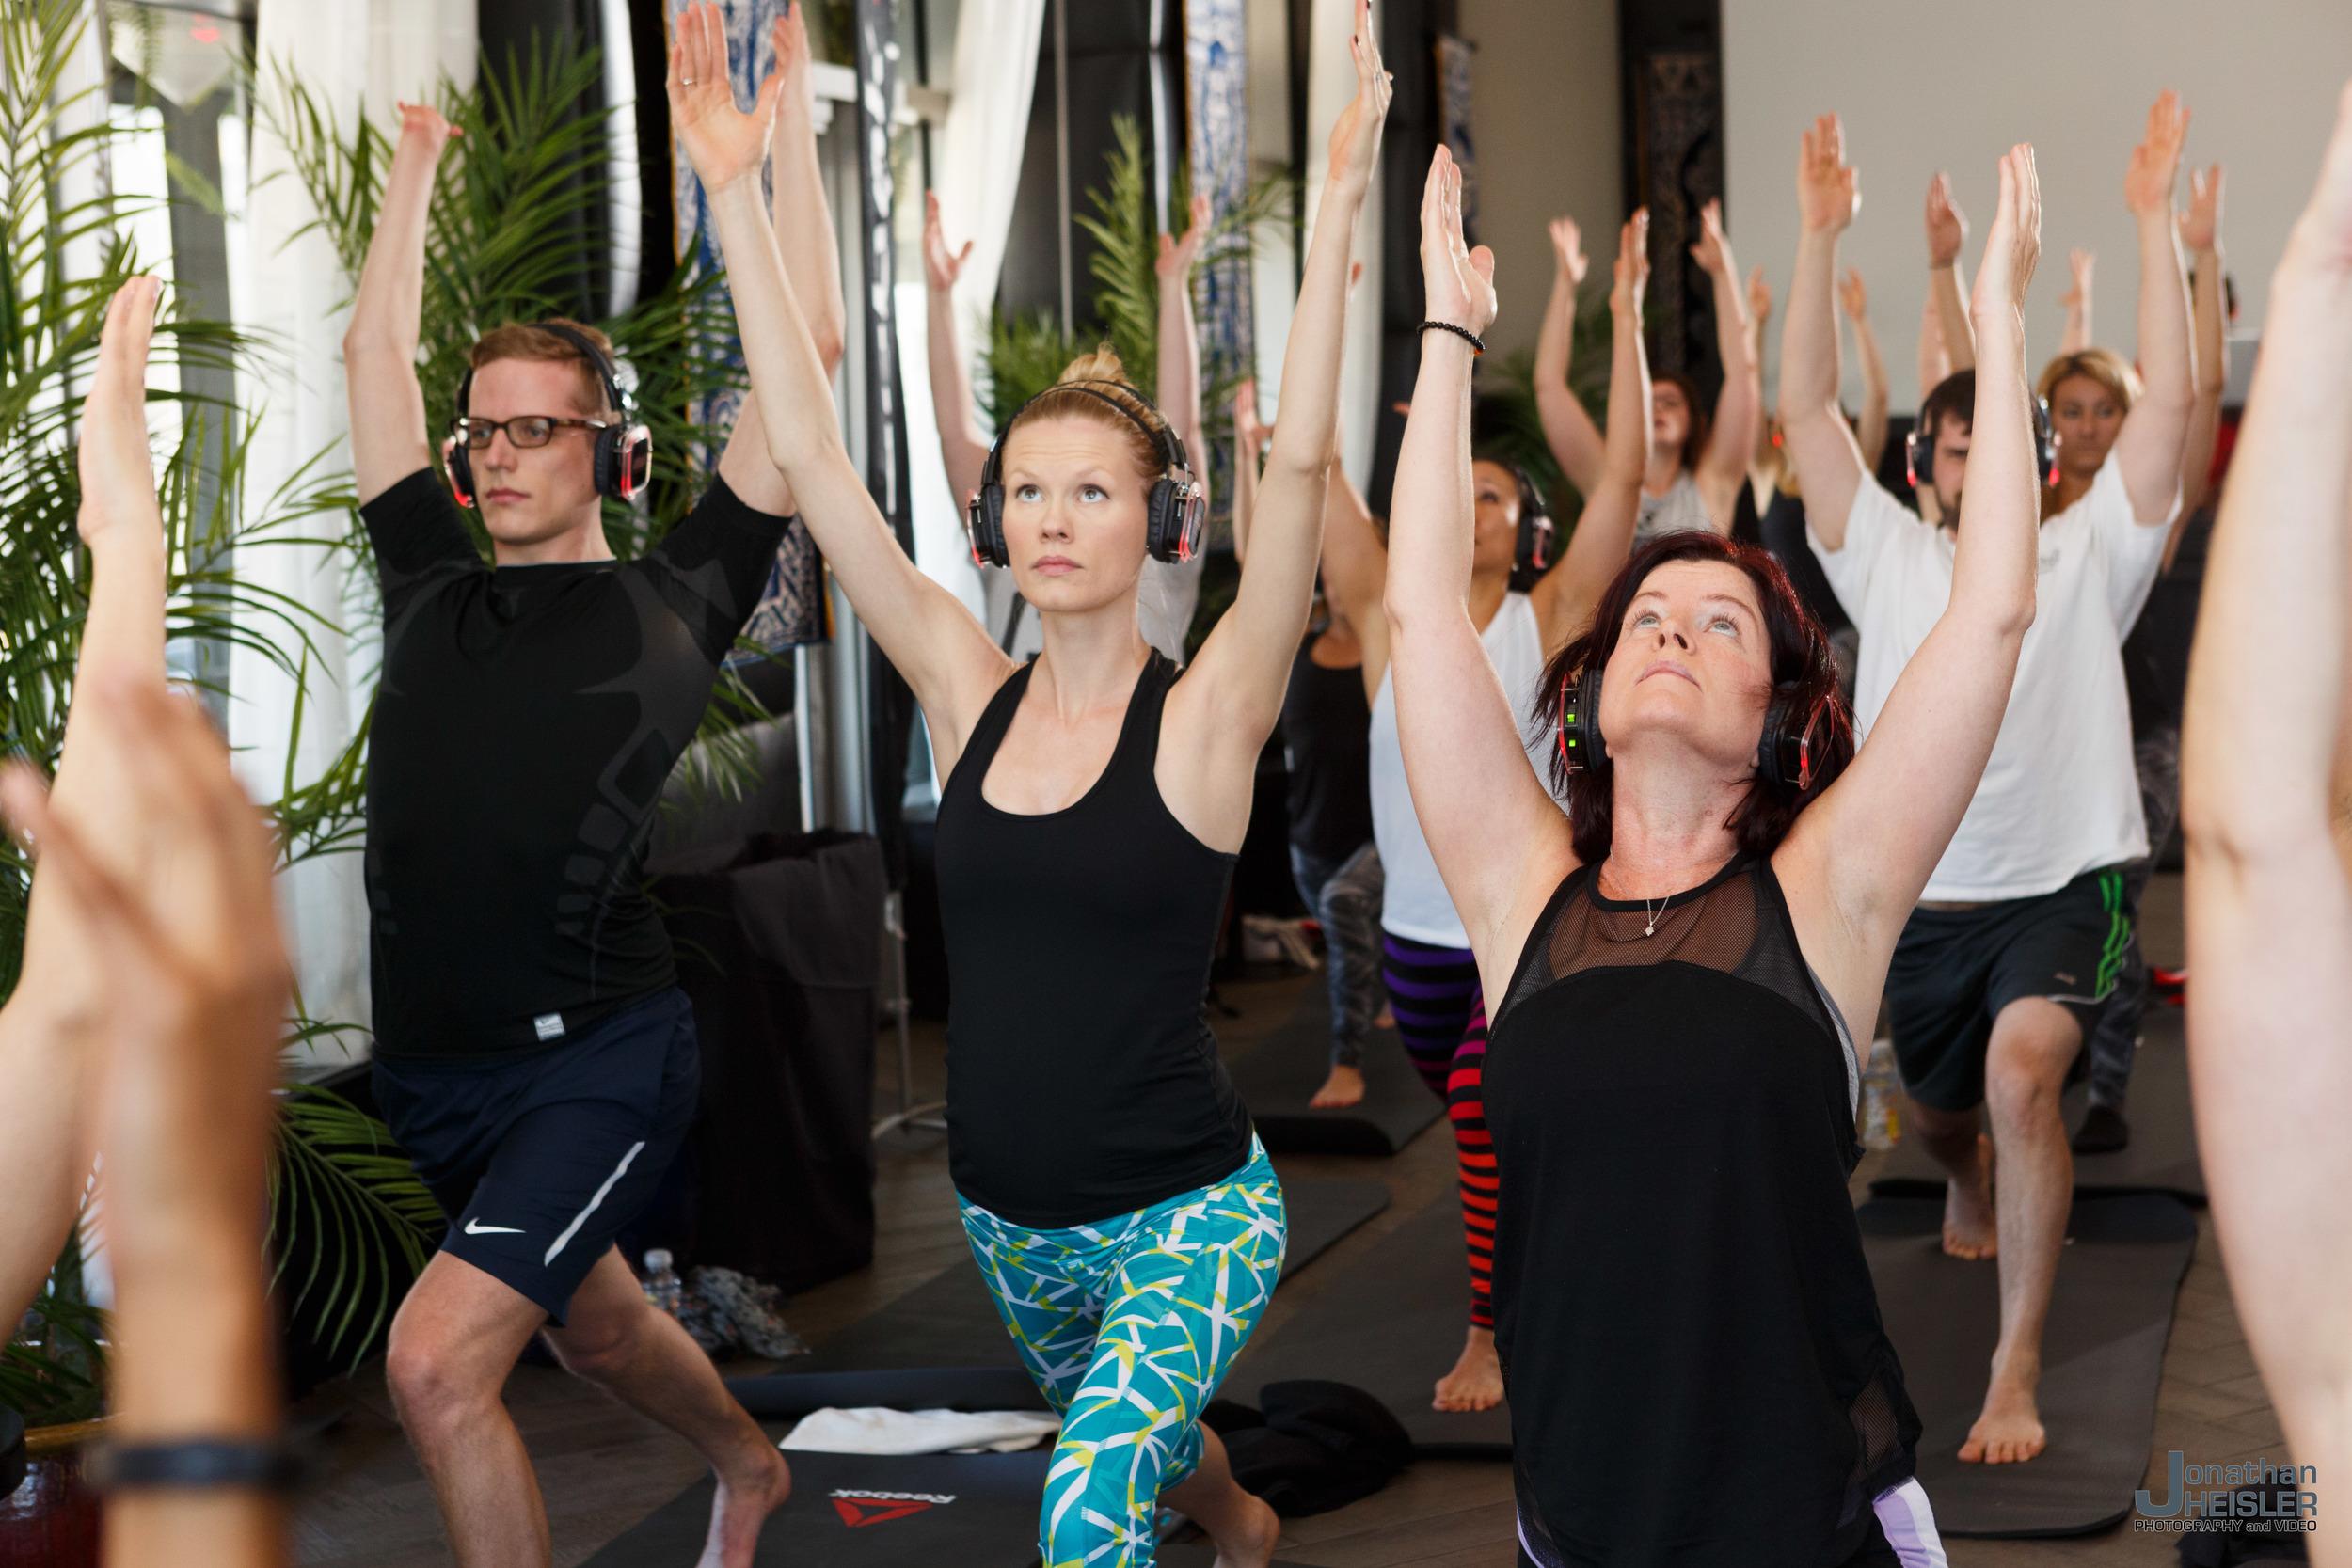 Reebok NYC Yoga_ Gansevoort Hotel NYC __  Jonathan Heisler _ 11.21.2015_012f_5.0.jpg